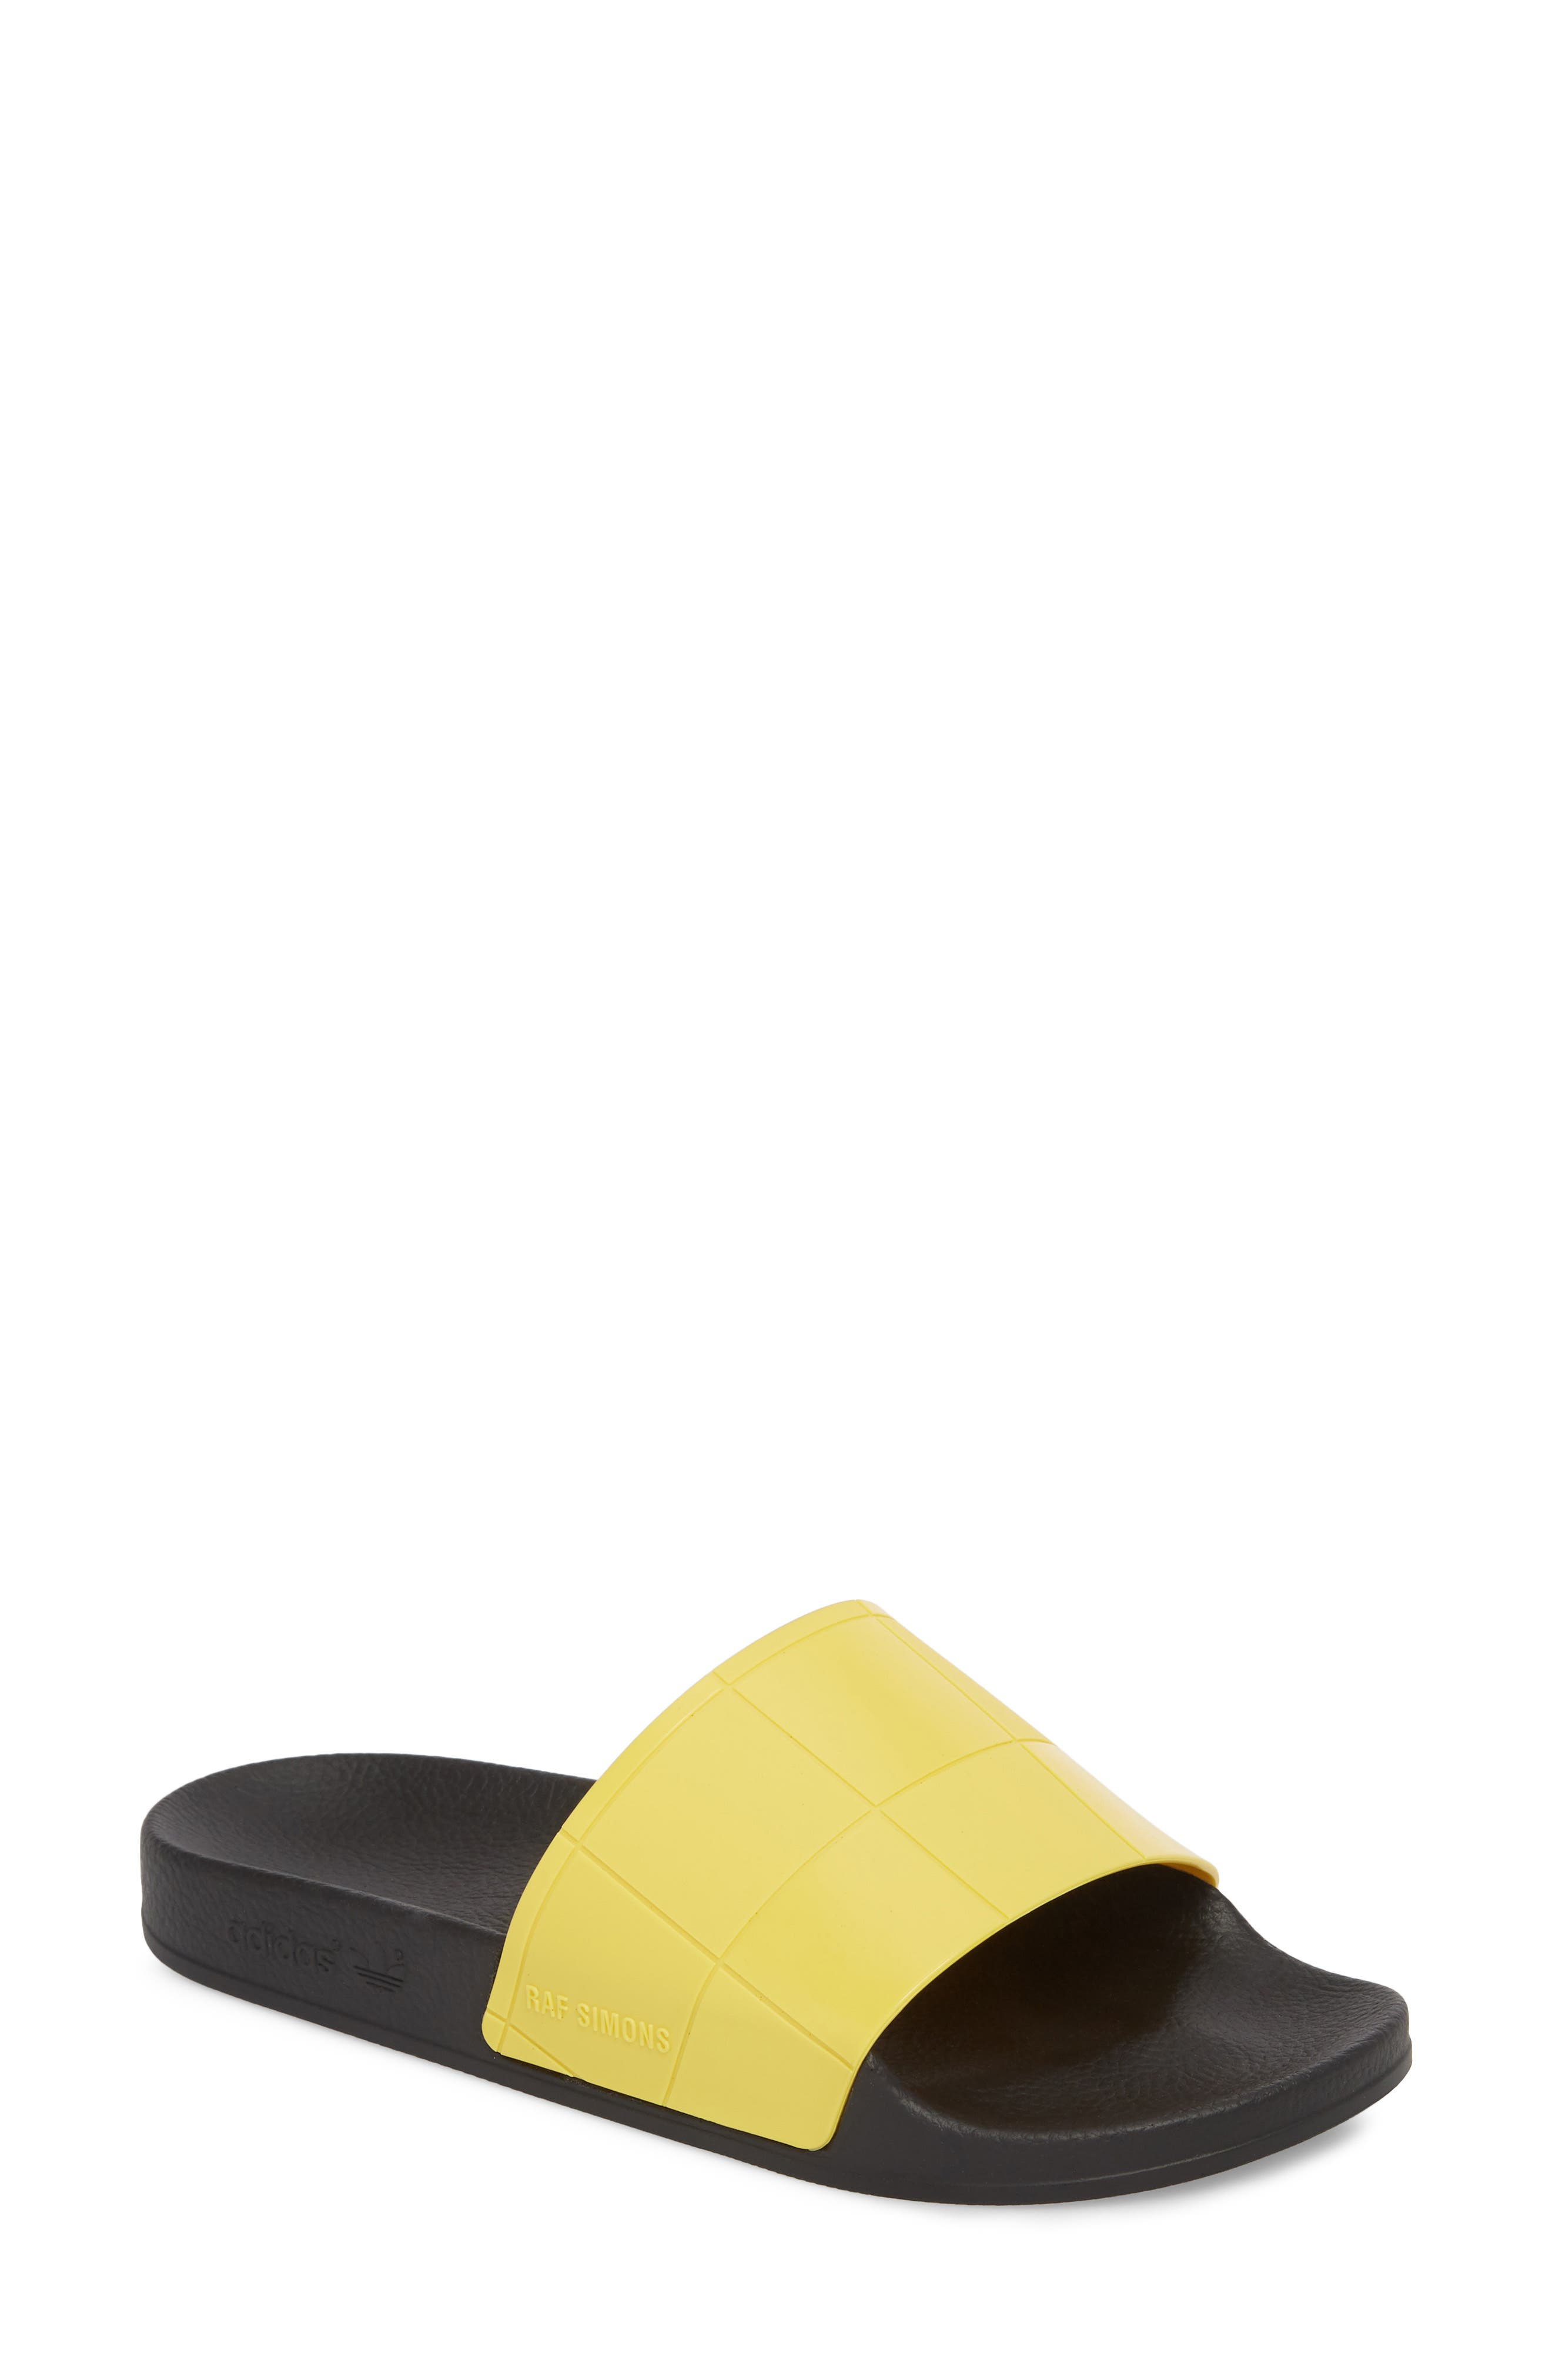 adidas by Raf Simons Adilette Slide Sandal (Women)